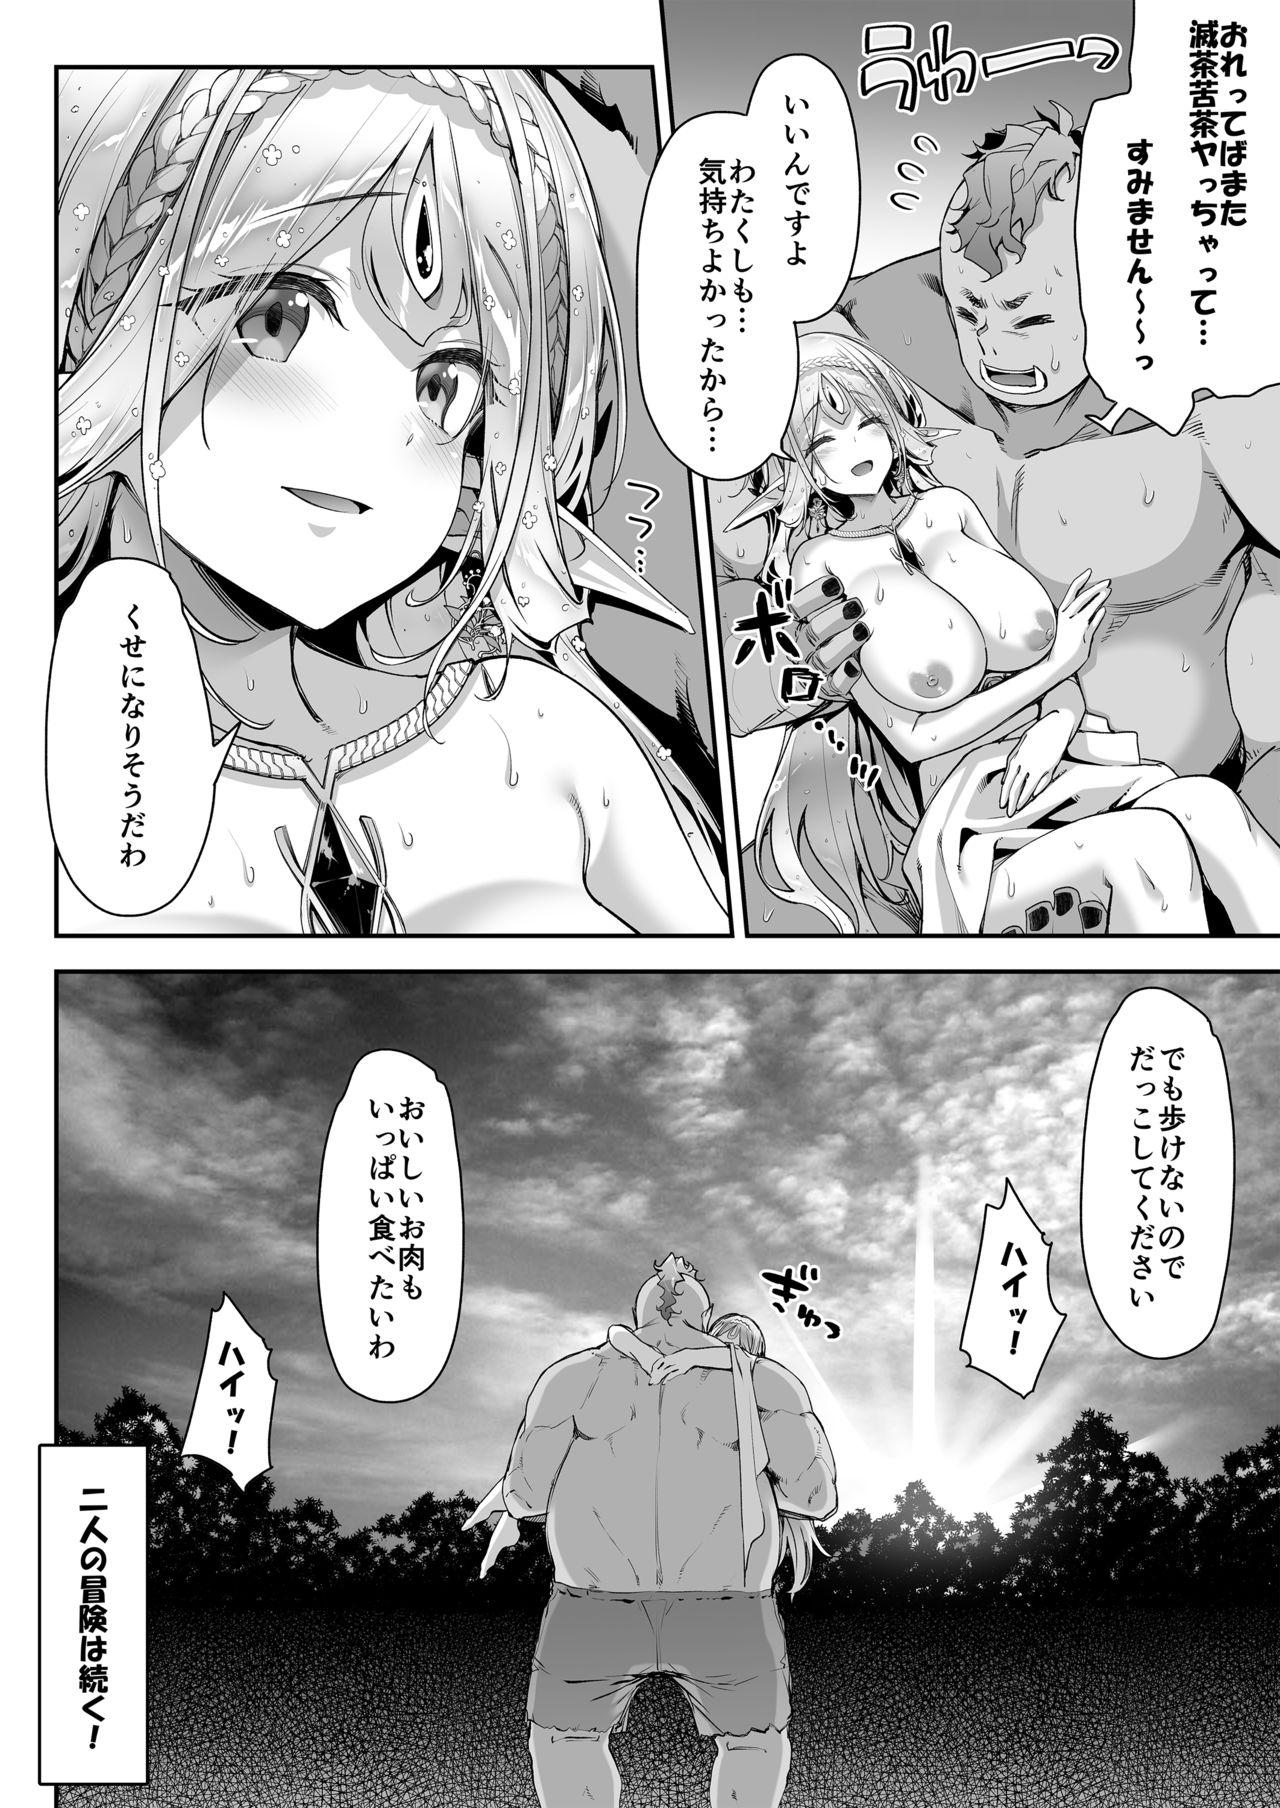 [Ichinose Land] Midara na Elf-san wa Orc-kun ga Osuki [Digital] 30